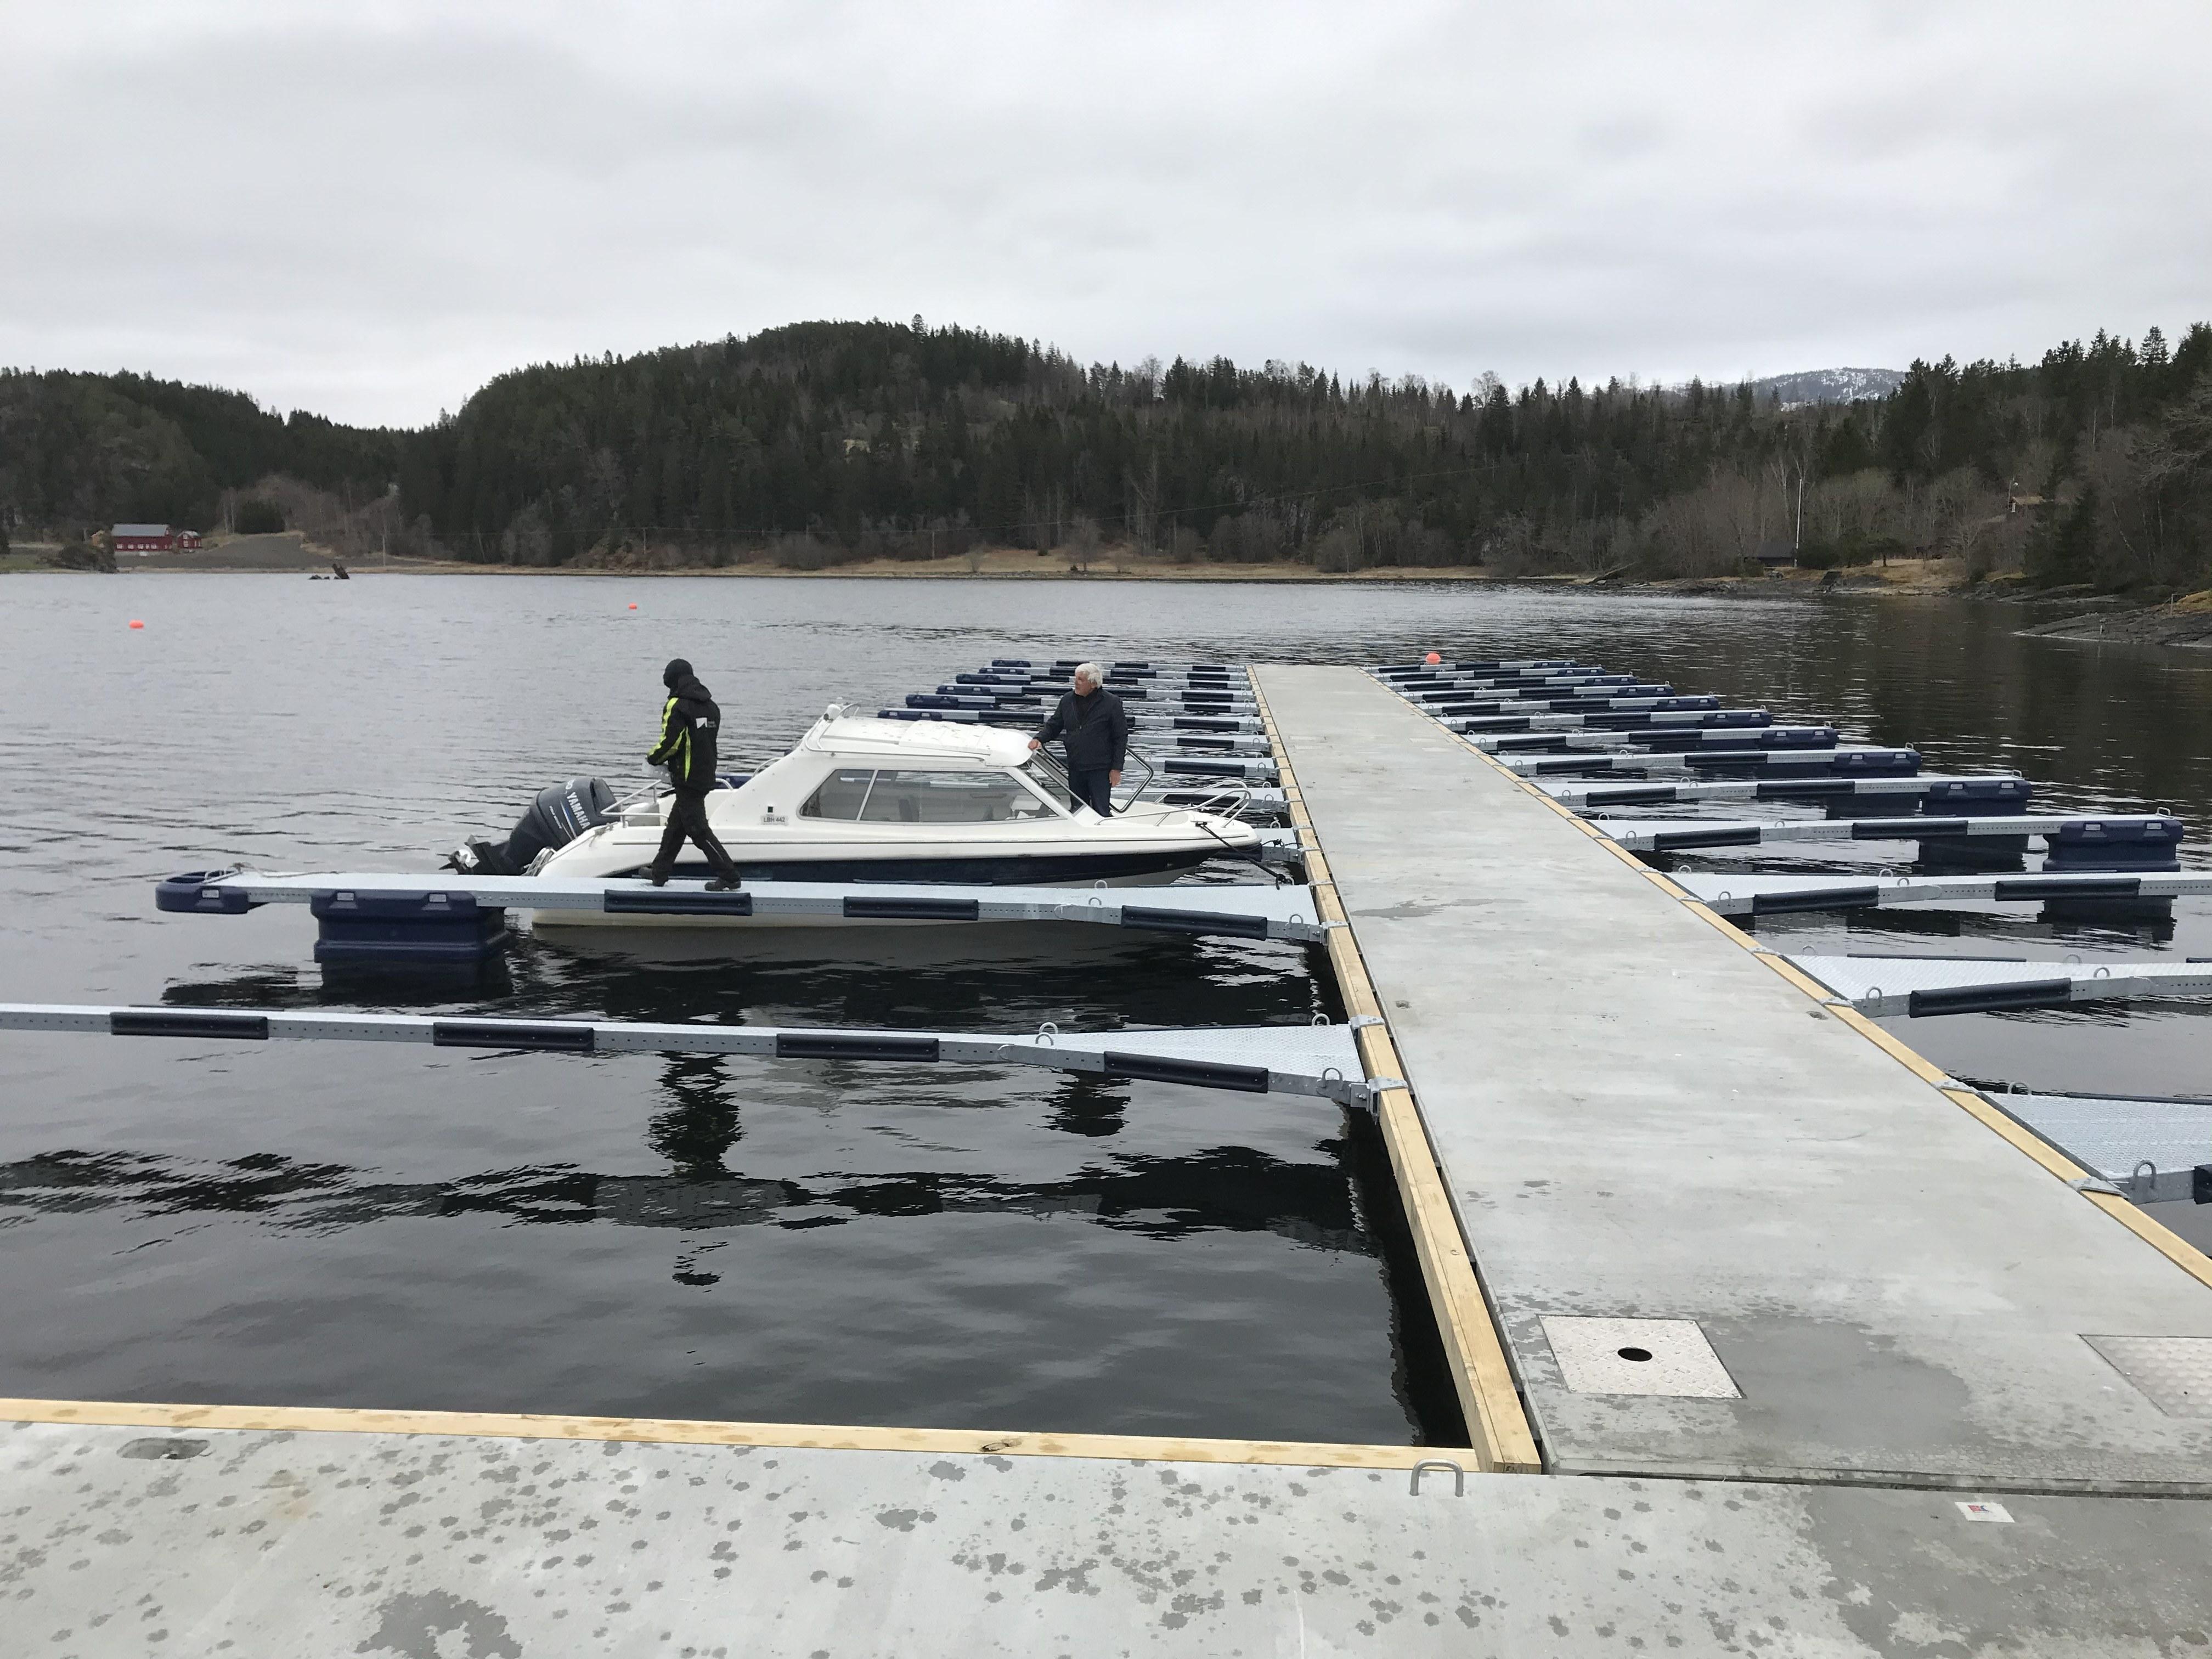 https://marinasolutions.no/uploads/Undli-Kai-Bryggeforening_Åsenfjord-1.jpg